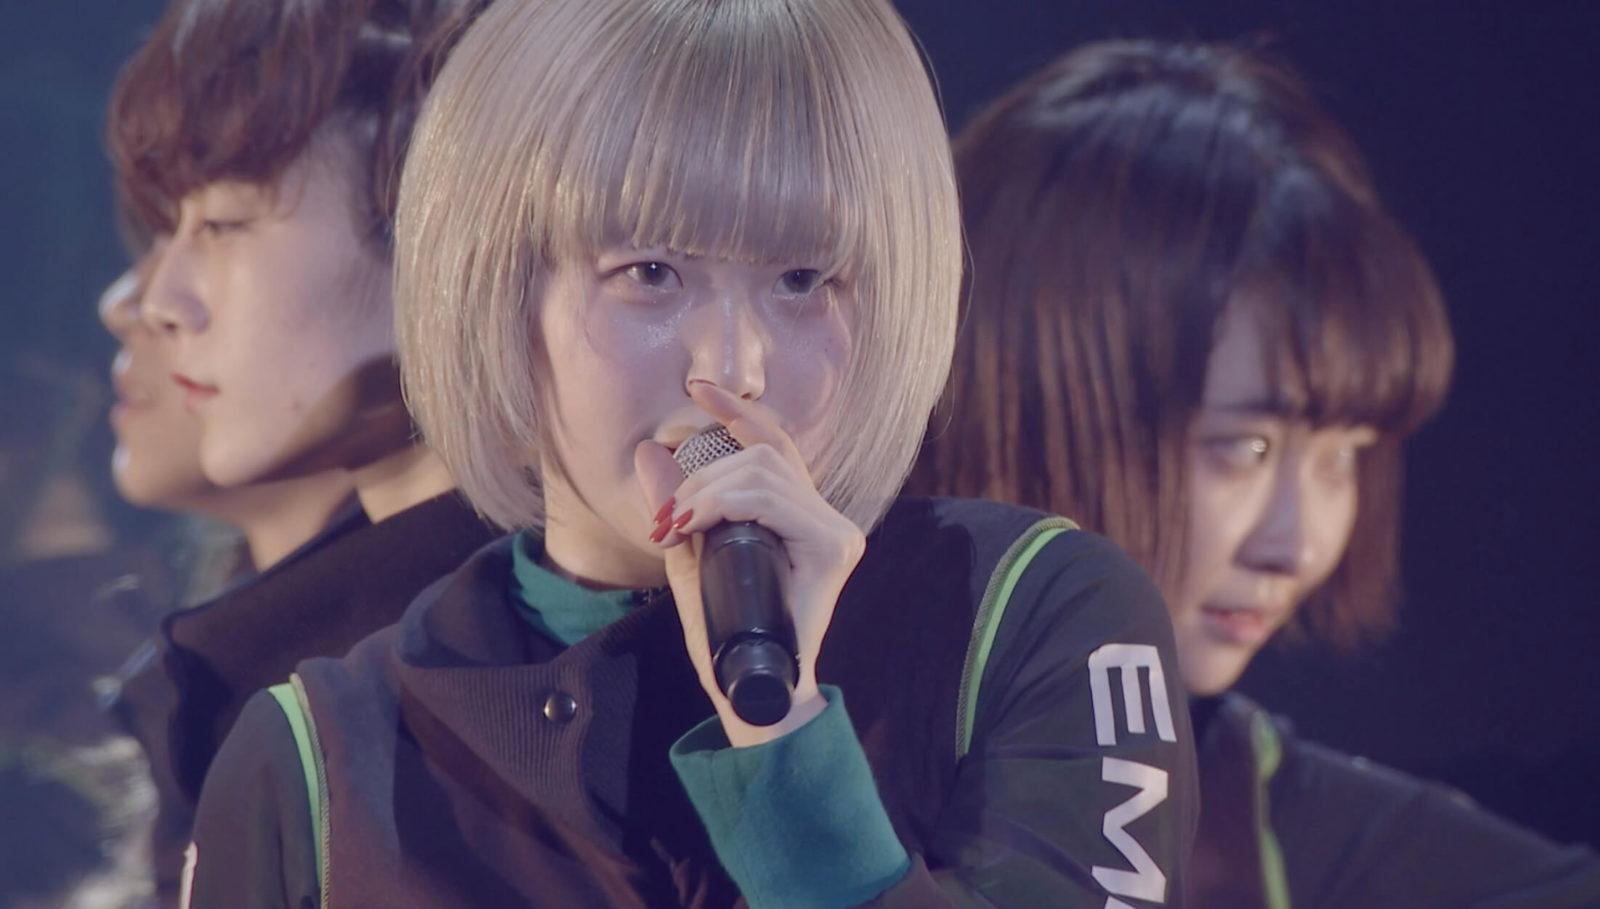 EMPiRE、リベンジZeppDiverCity公演より「Have it my way」LIVE動画公開サムネイル画像